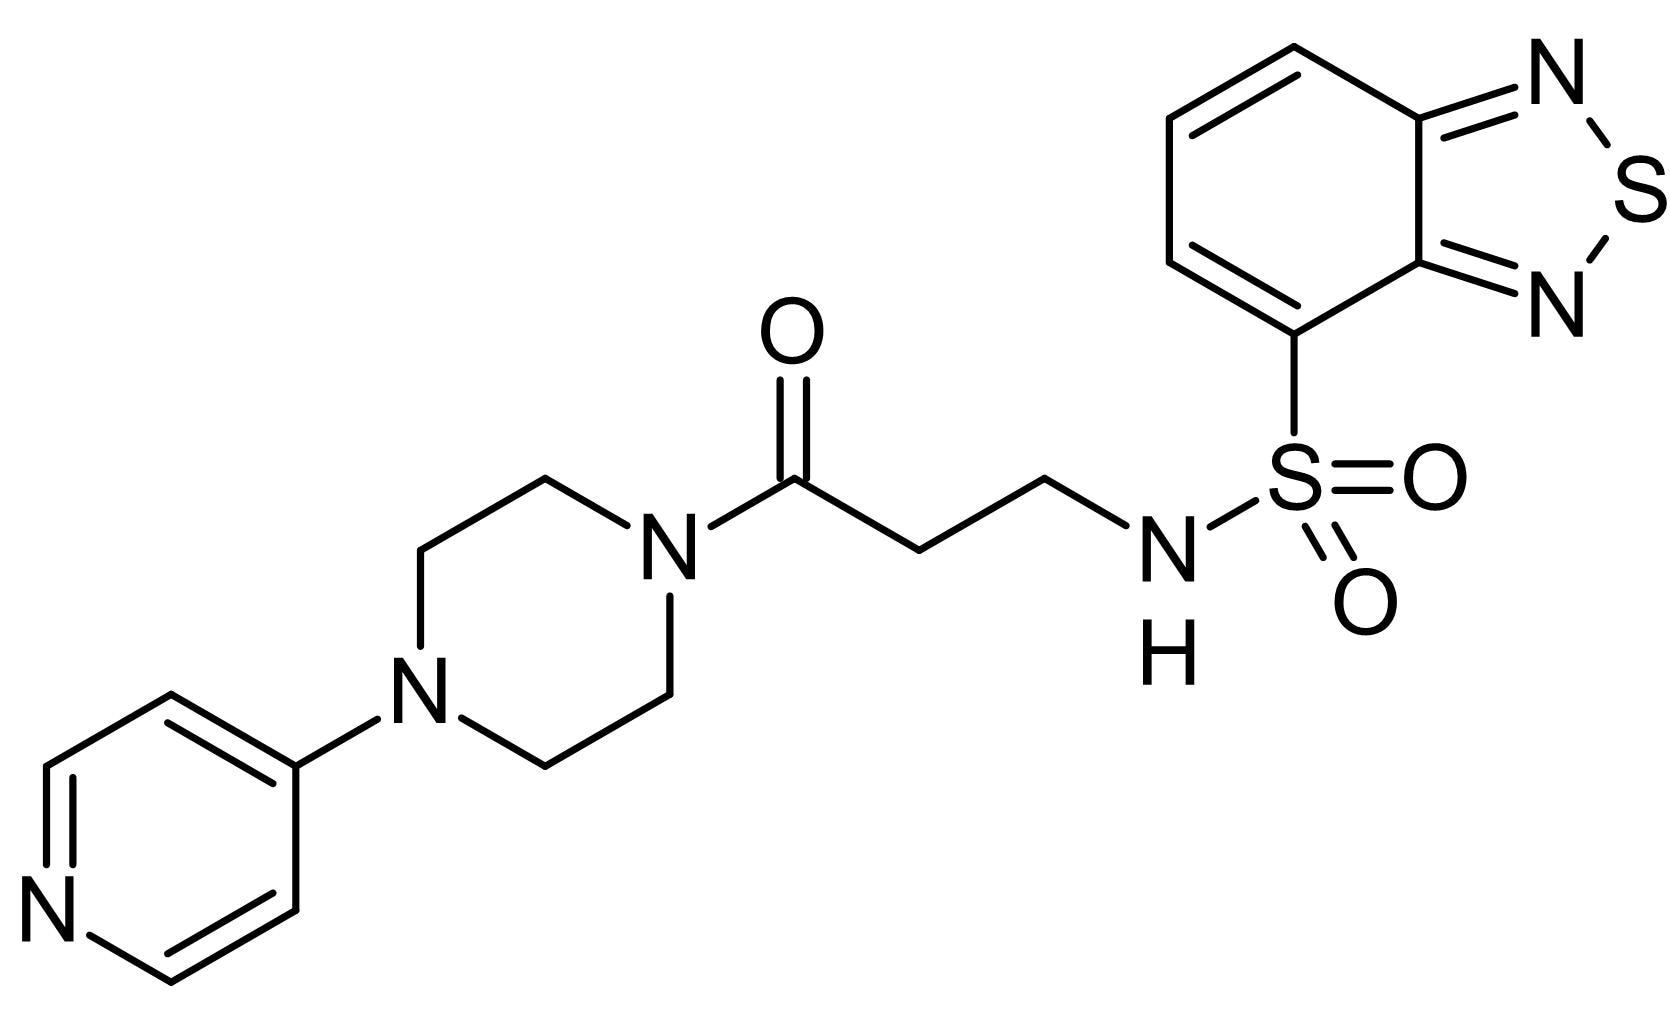 Chemical Structure - VU0255035, muscarinic M<sub>1</sub> antagonist (ab141424)